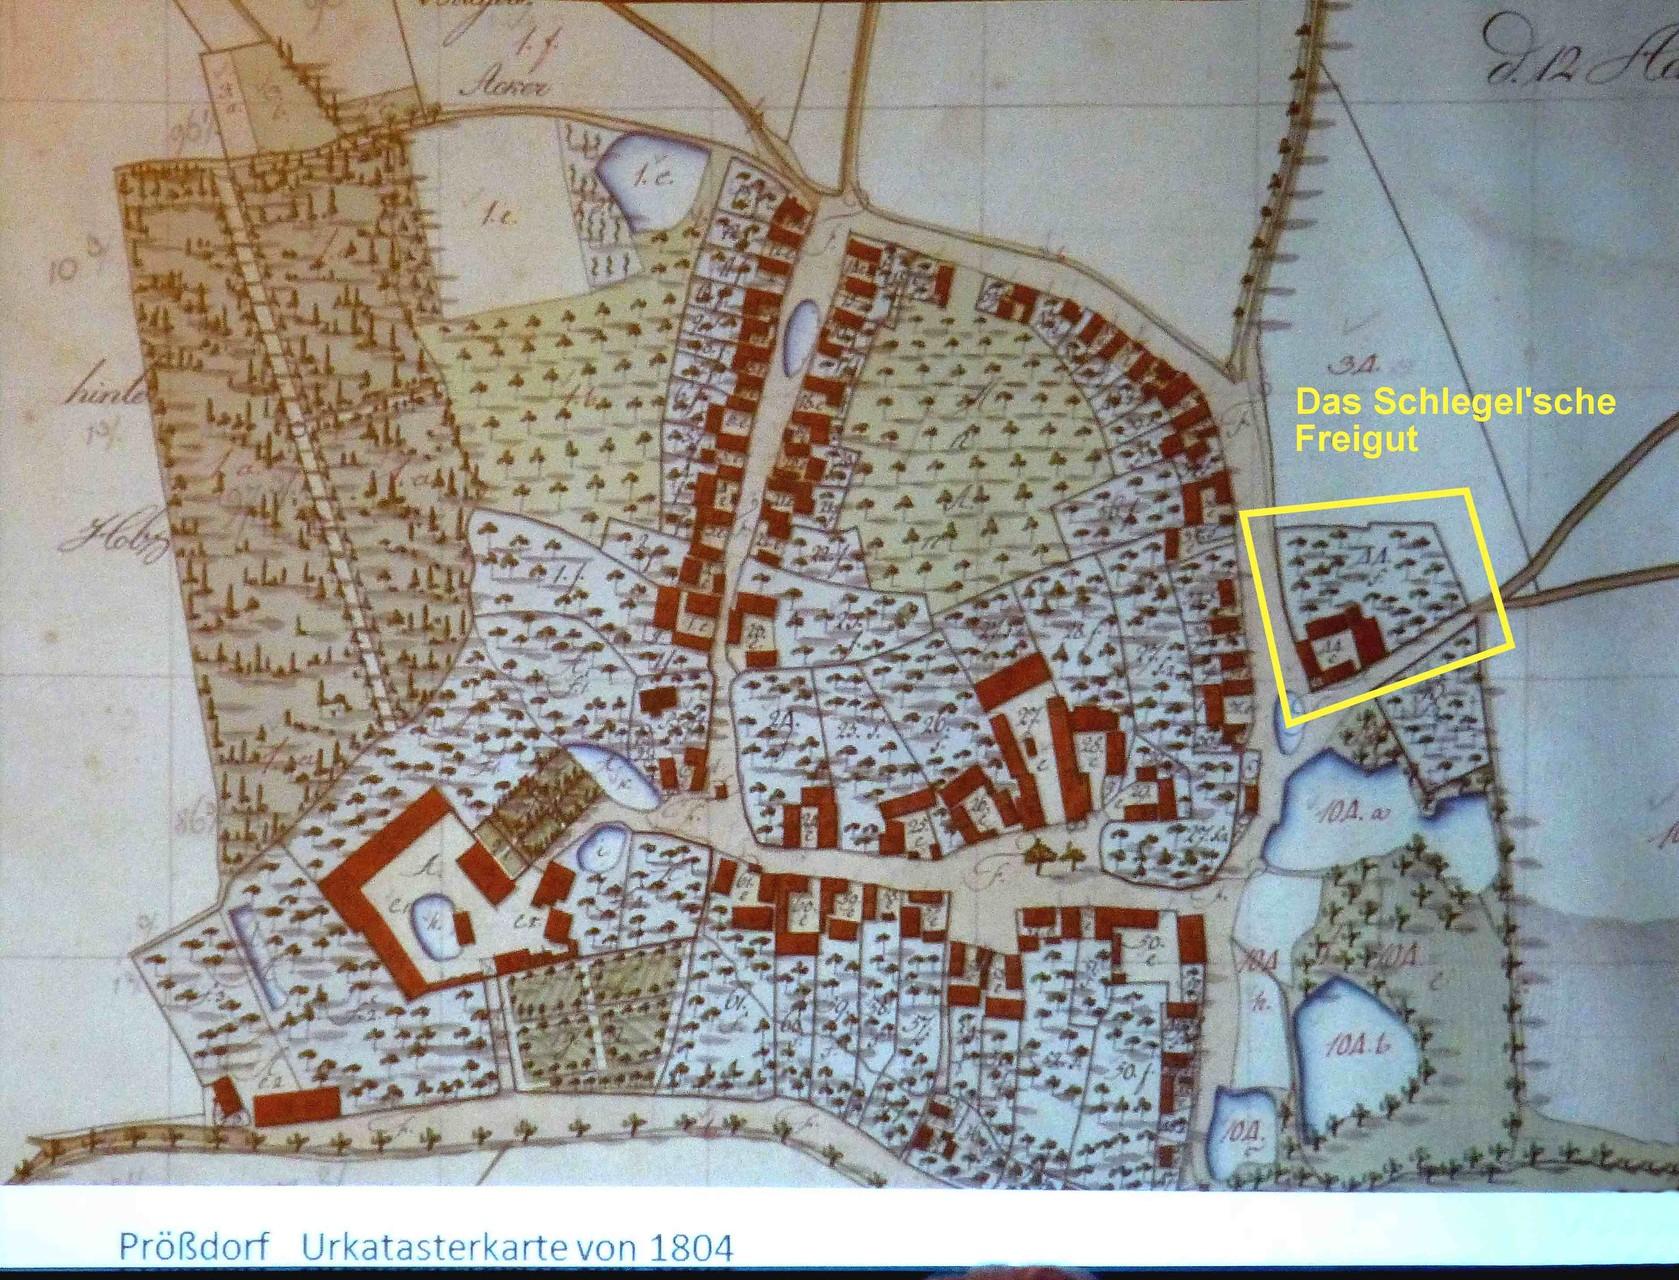 Prößdorf um 1804; Lage Freigut Schlegel